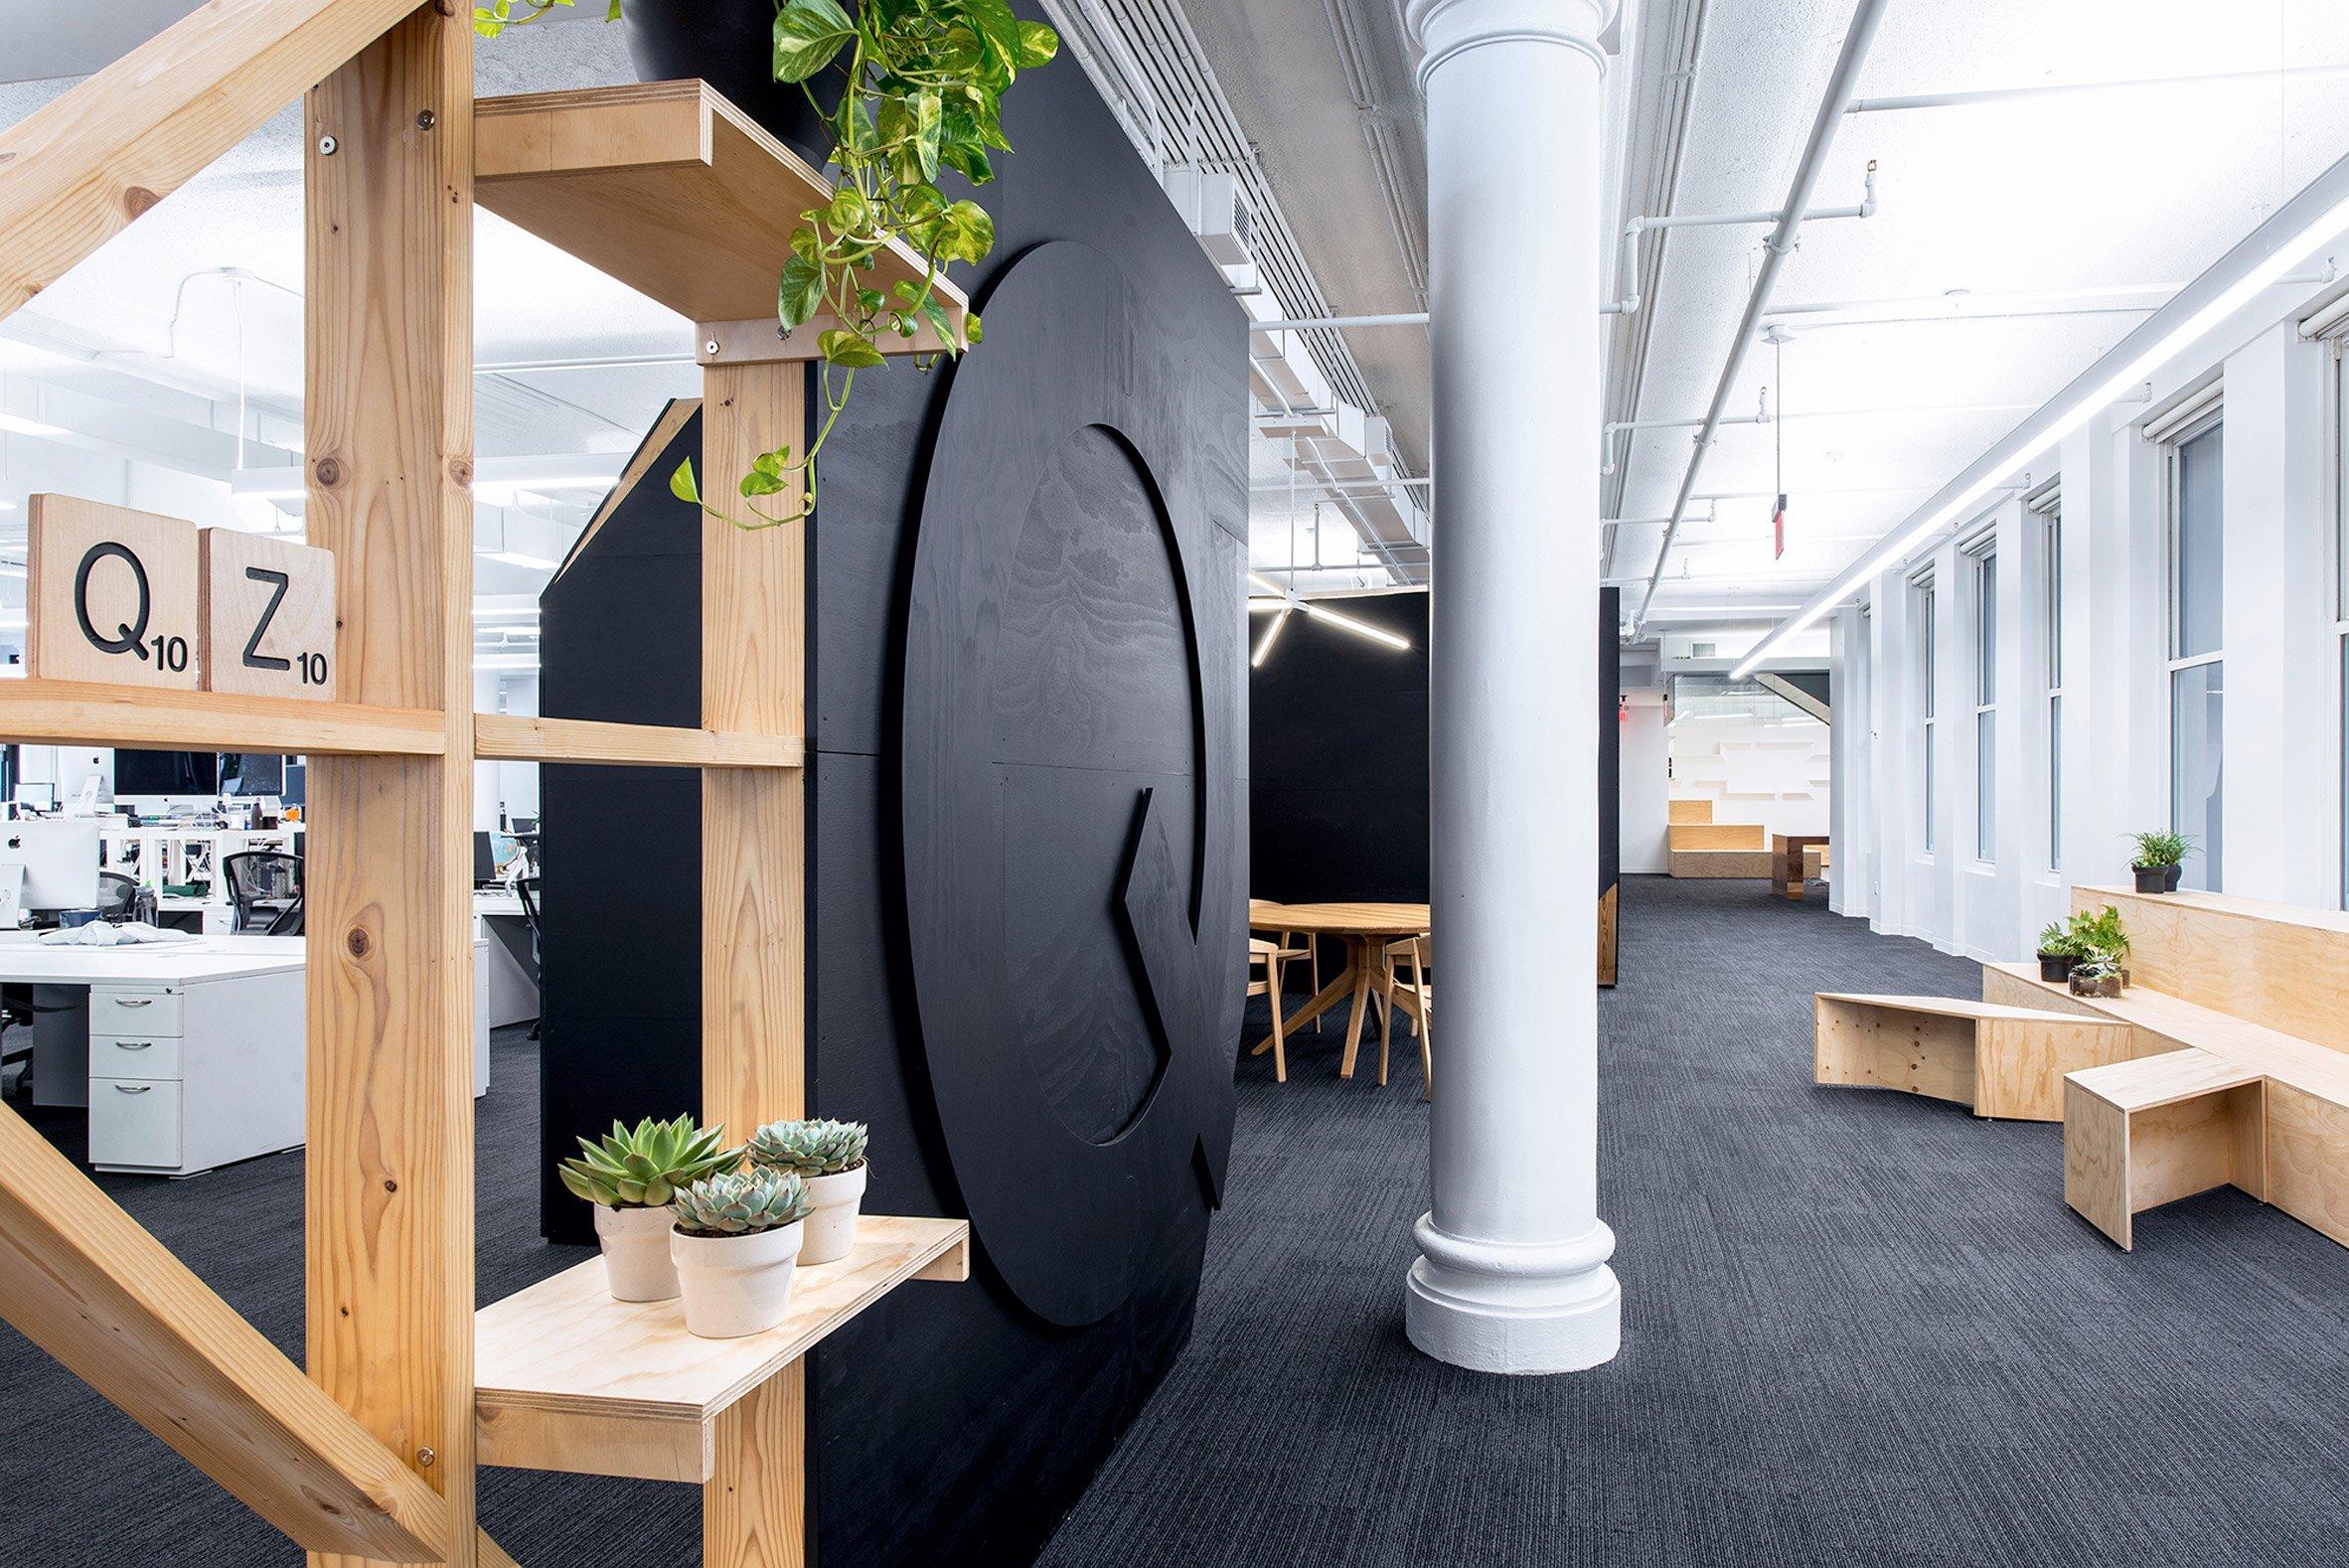 architecture-interiors-offices- manhatten-new-york-design-studia-osnovadesign-osnova-poltava_24